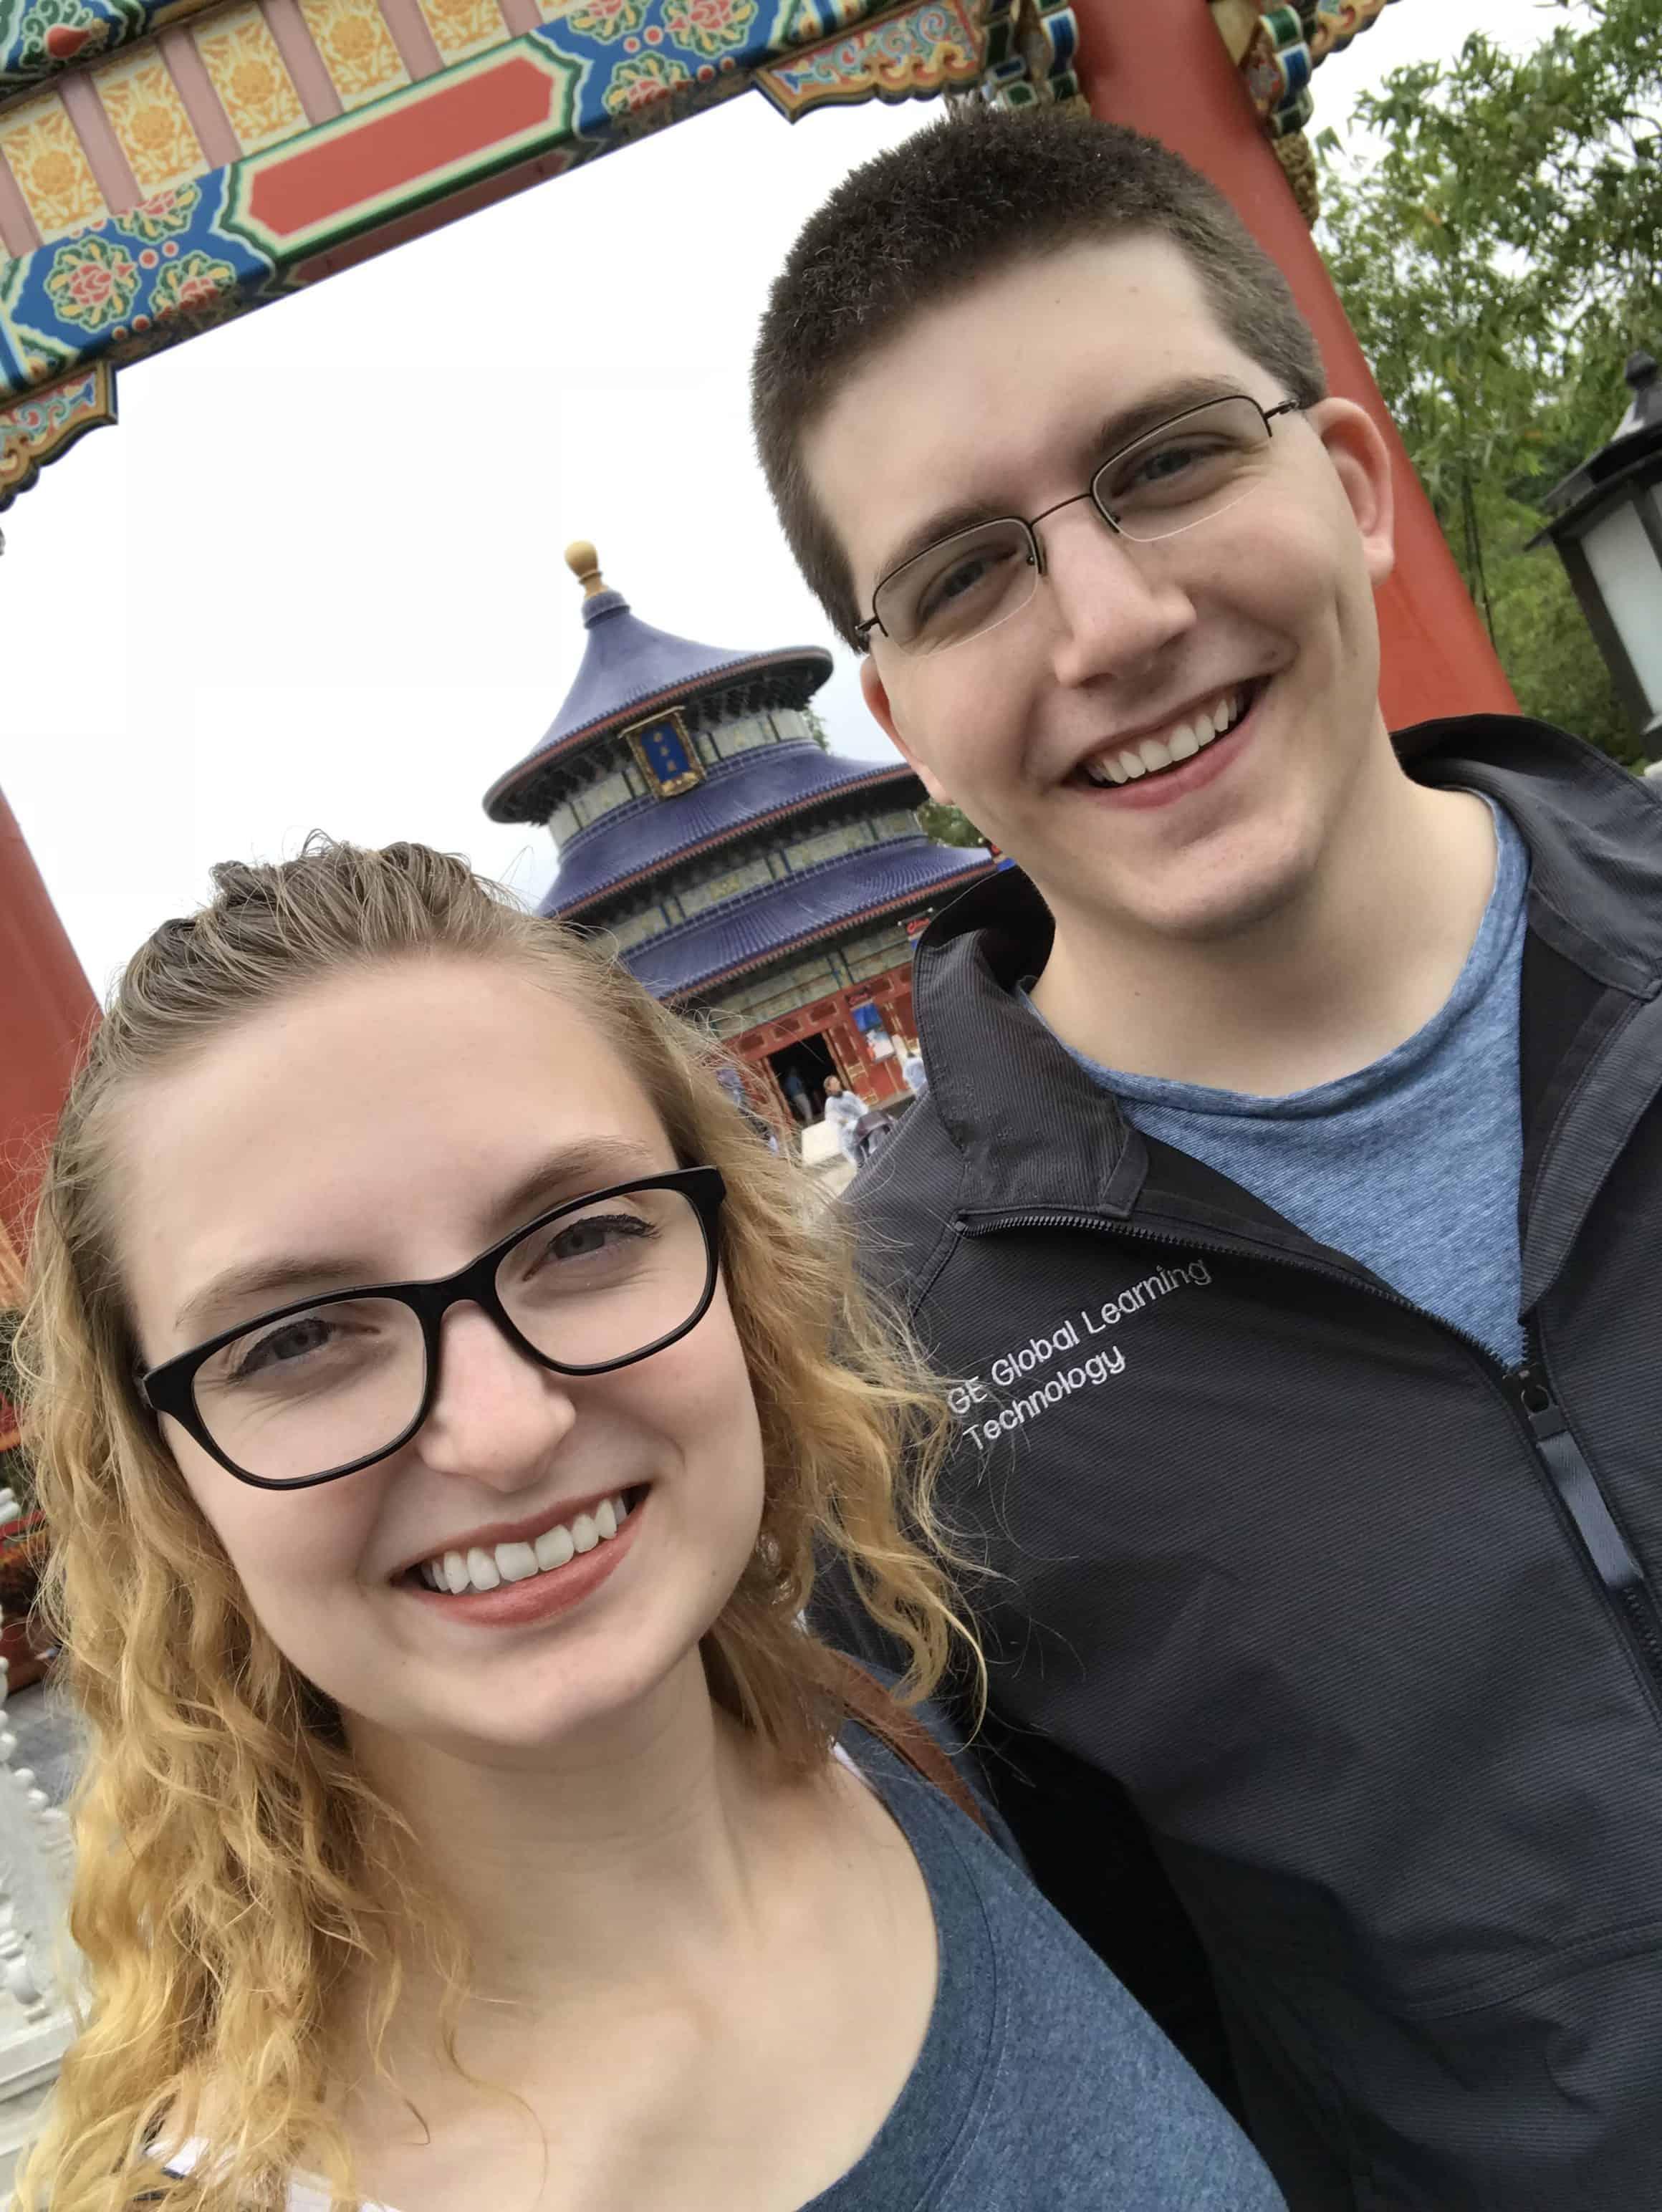 Pre-engagement Selfie at China